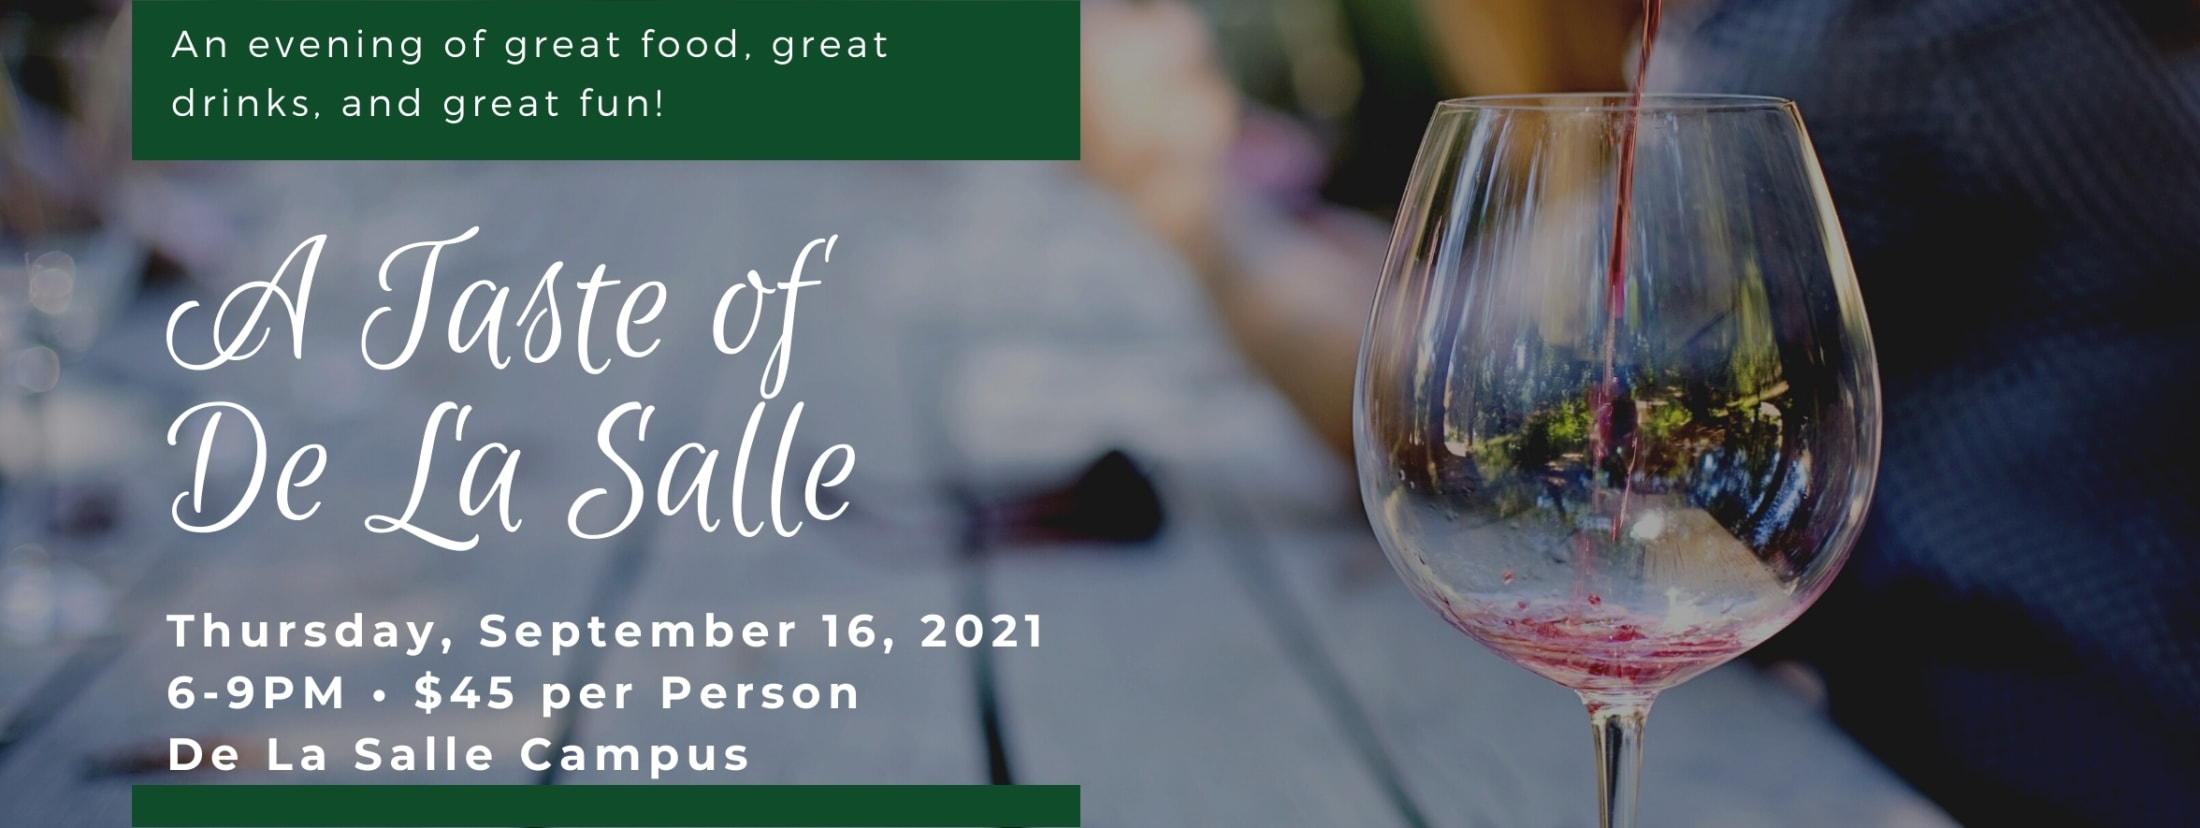 2021 A Taste of De La Salle Image